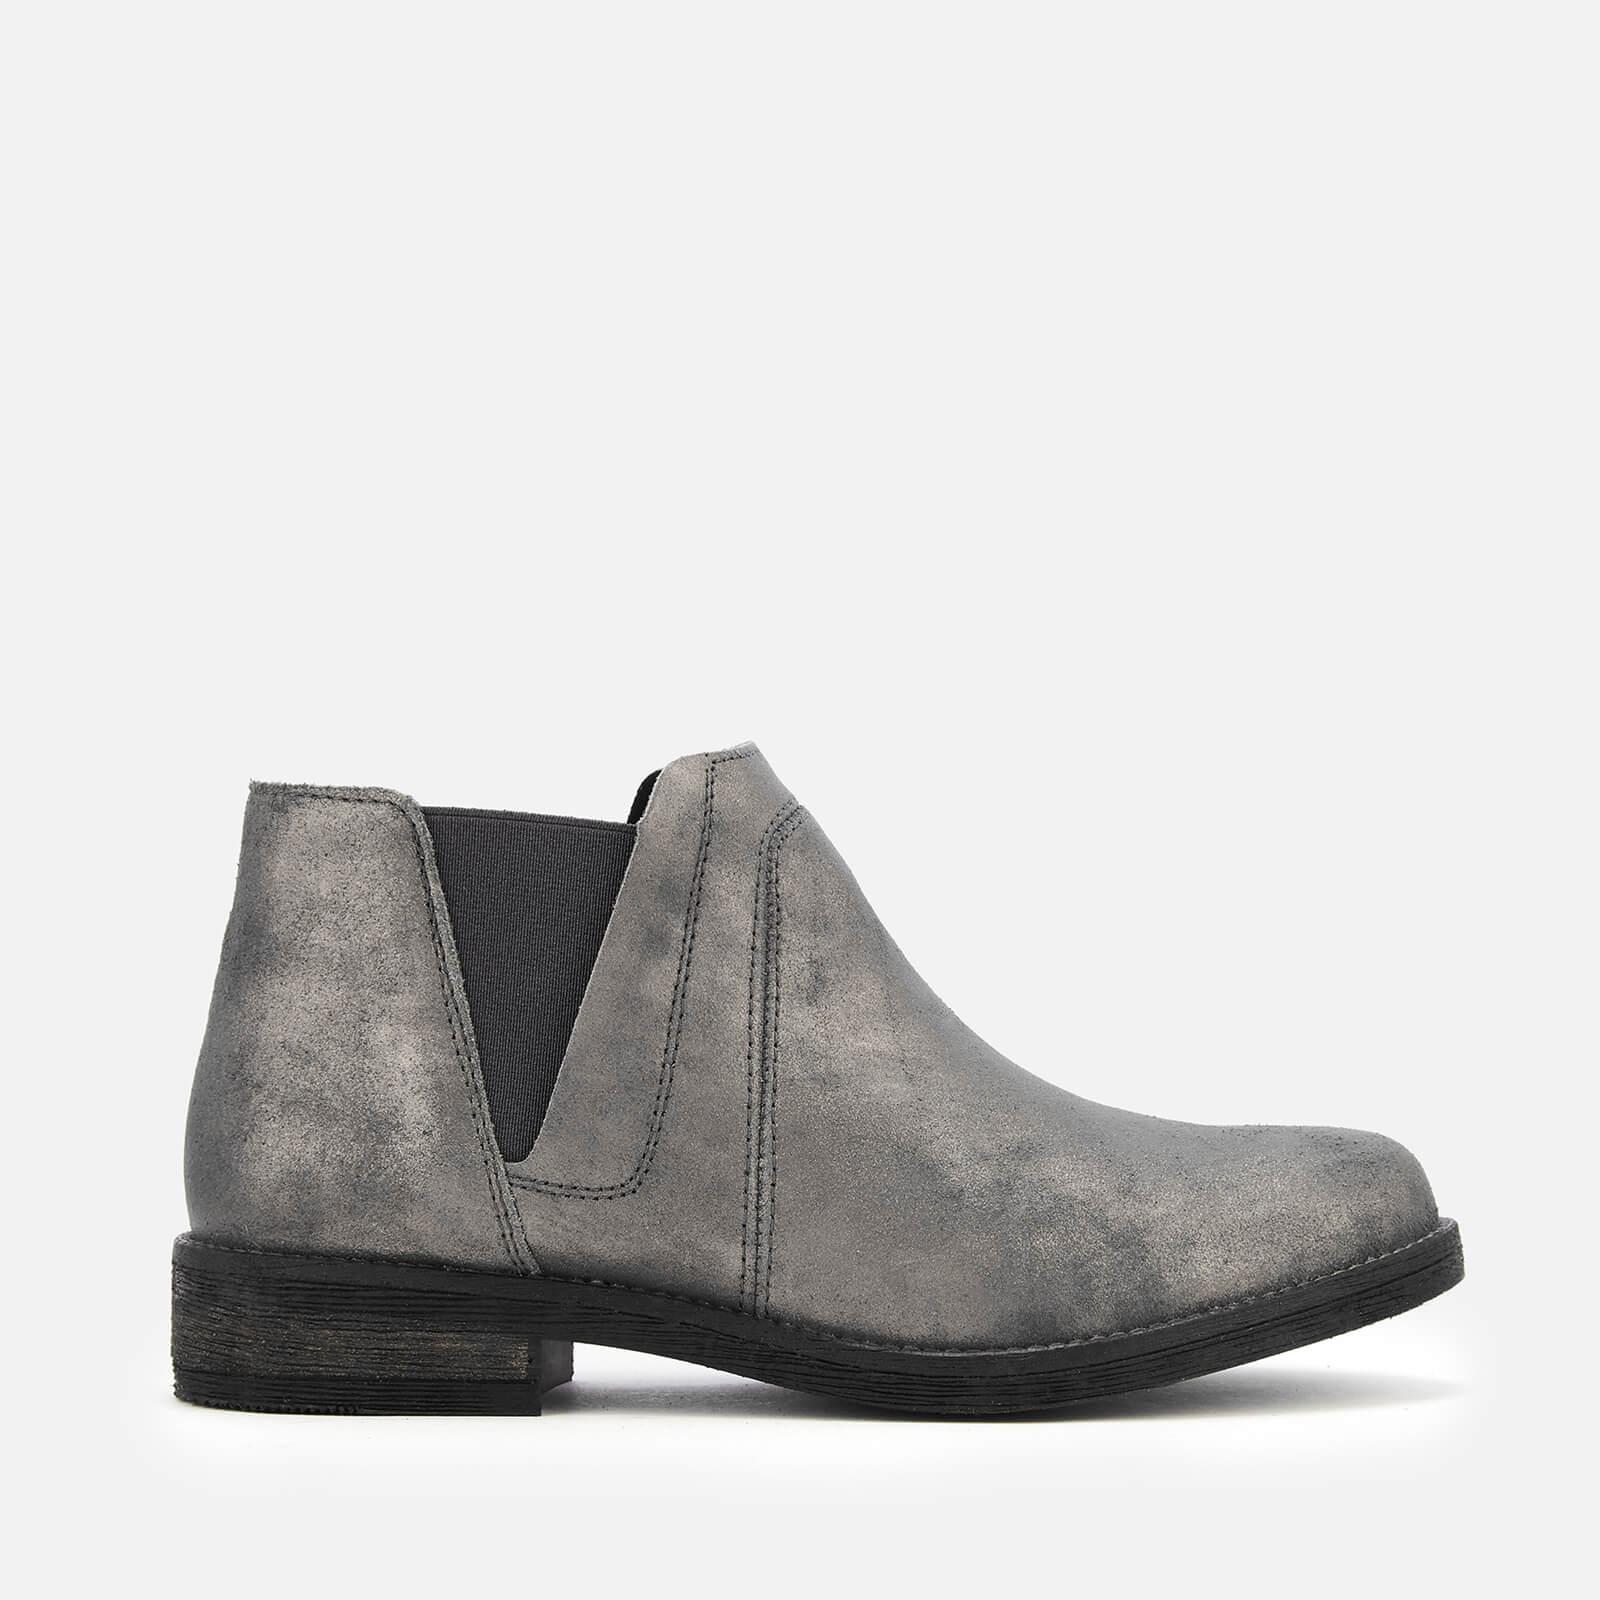 Clarks Women's Demi Beat Suede Ankle Boots - Dark Grey - UK 7 - Grey